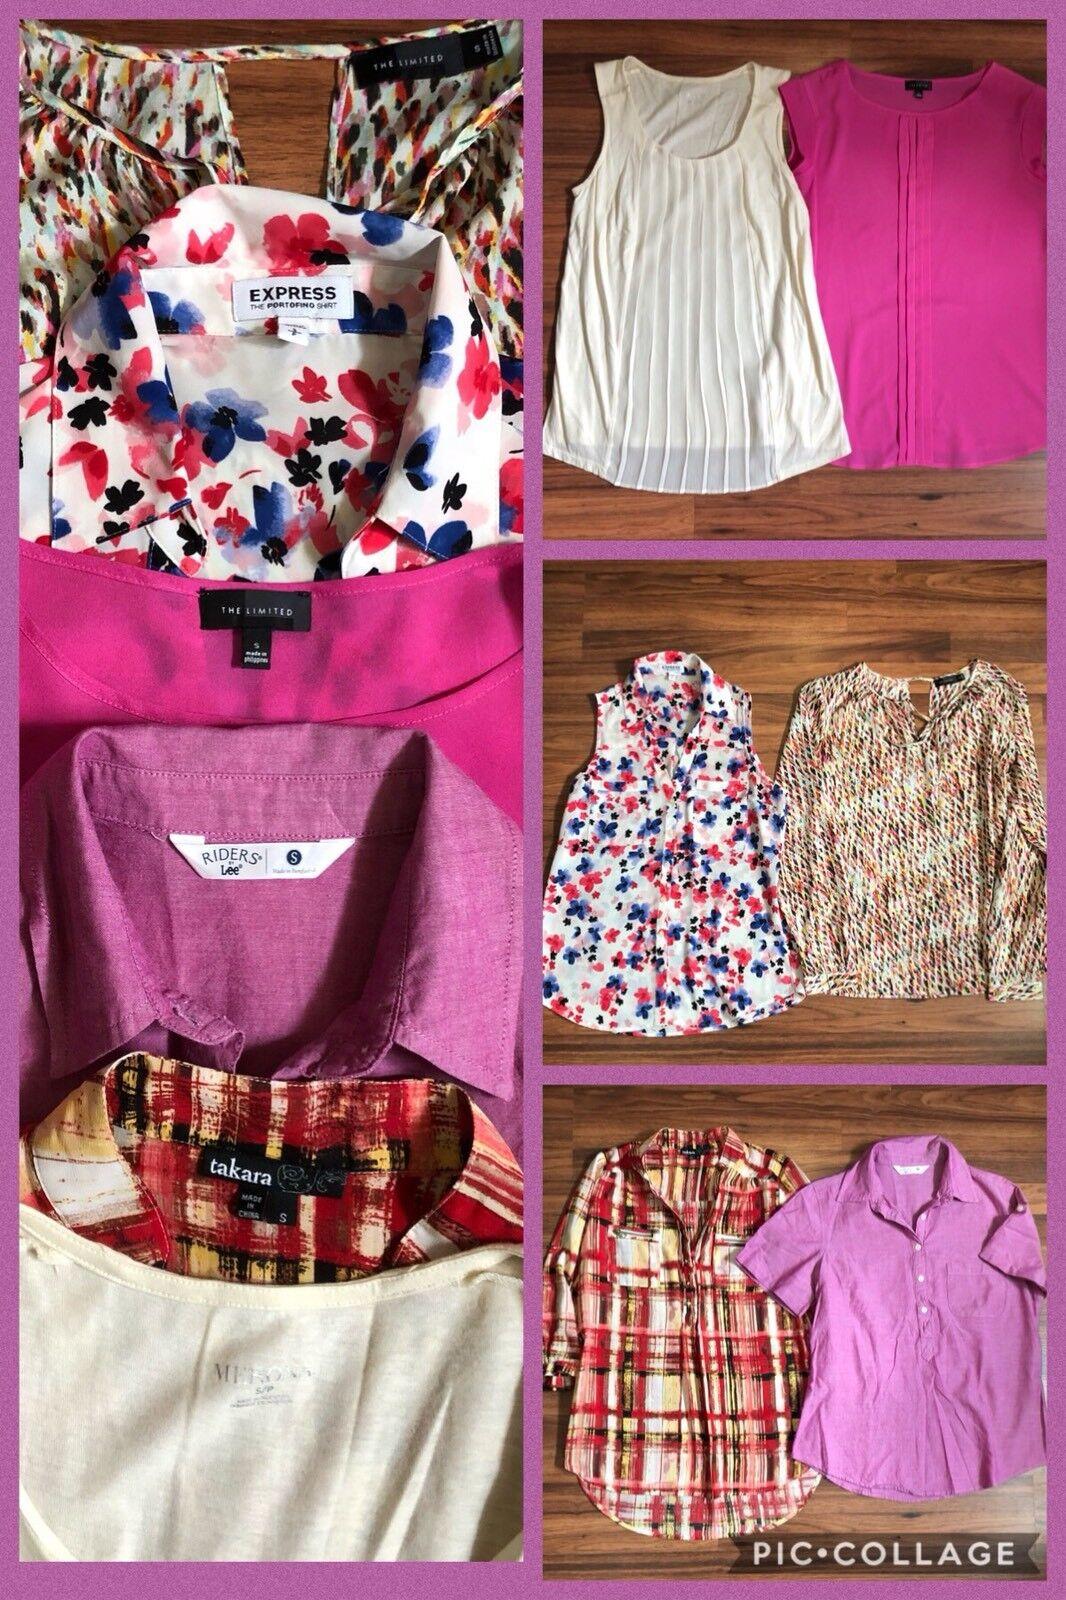 LOT 6 Women's Dress Career Tops The Limited Express Merona Lee Takara Size S